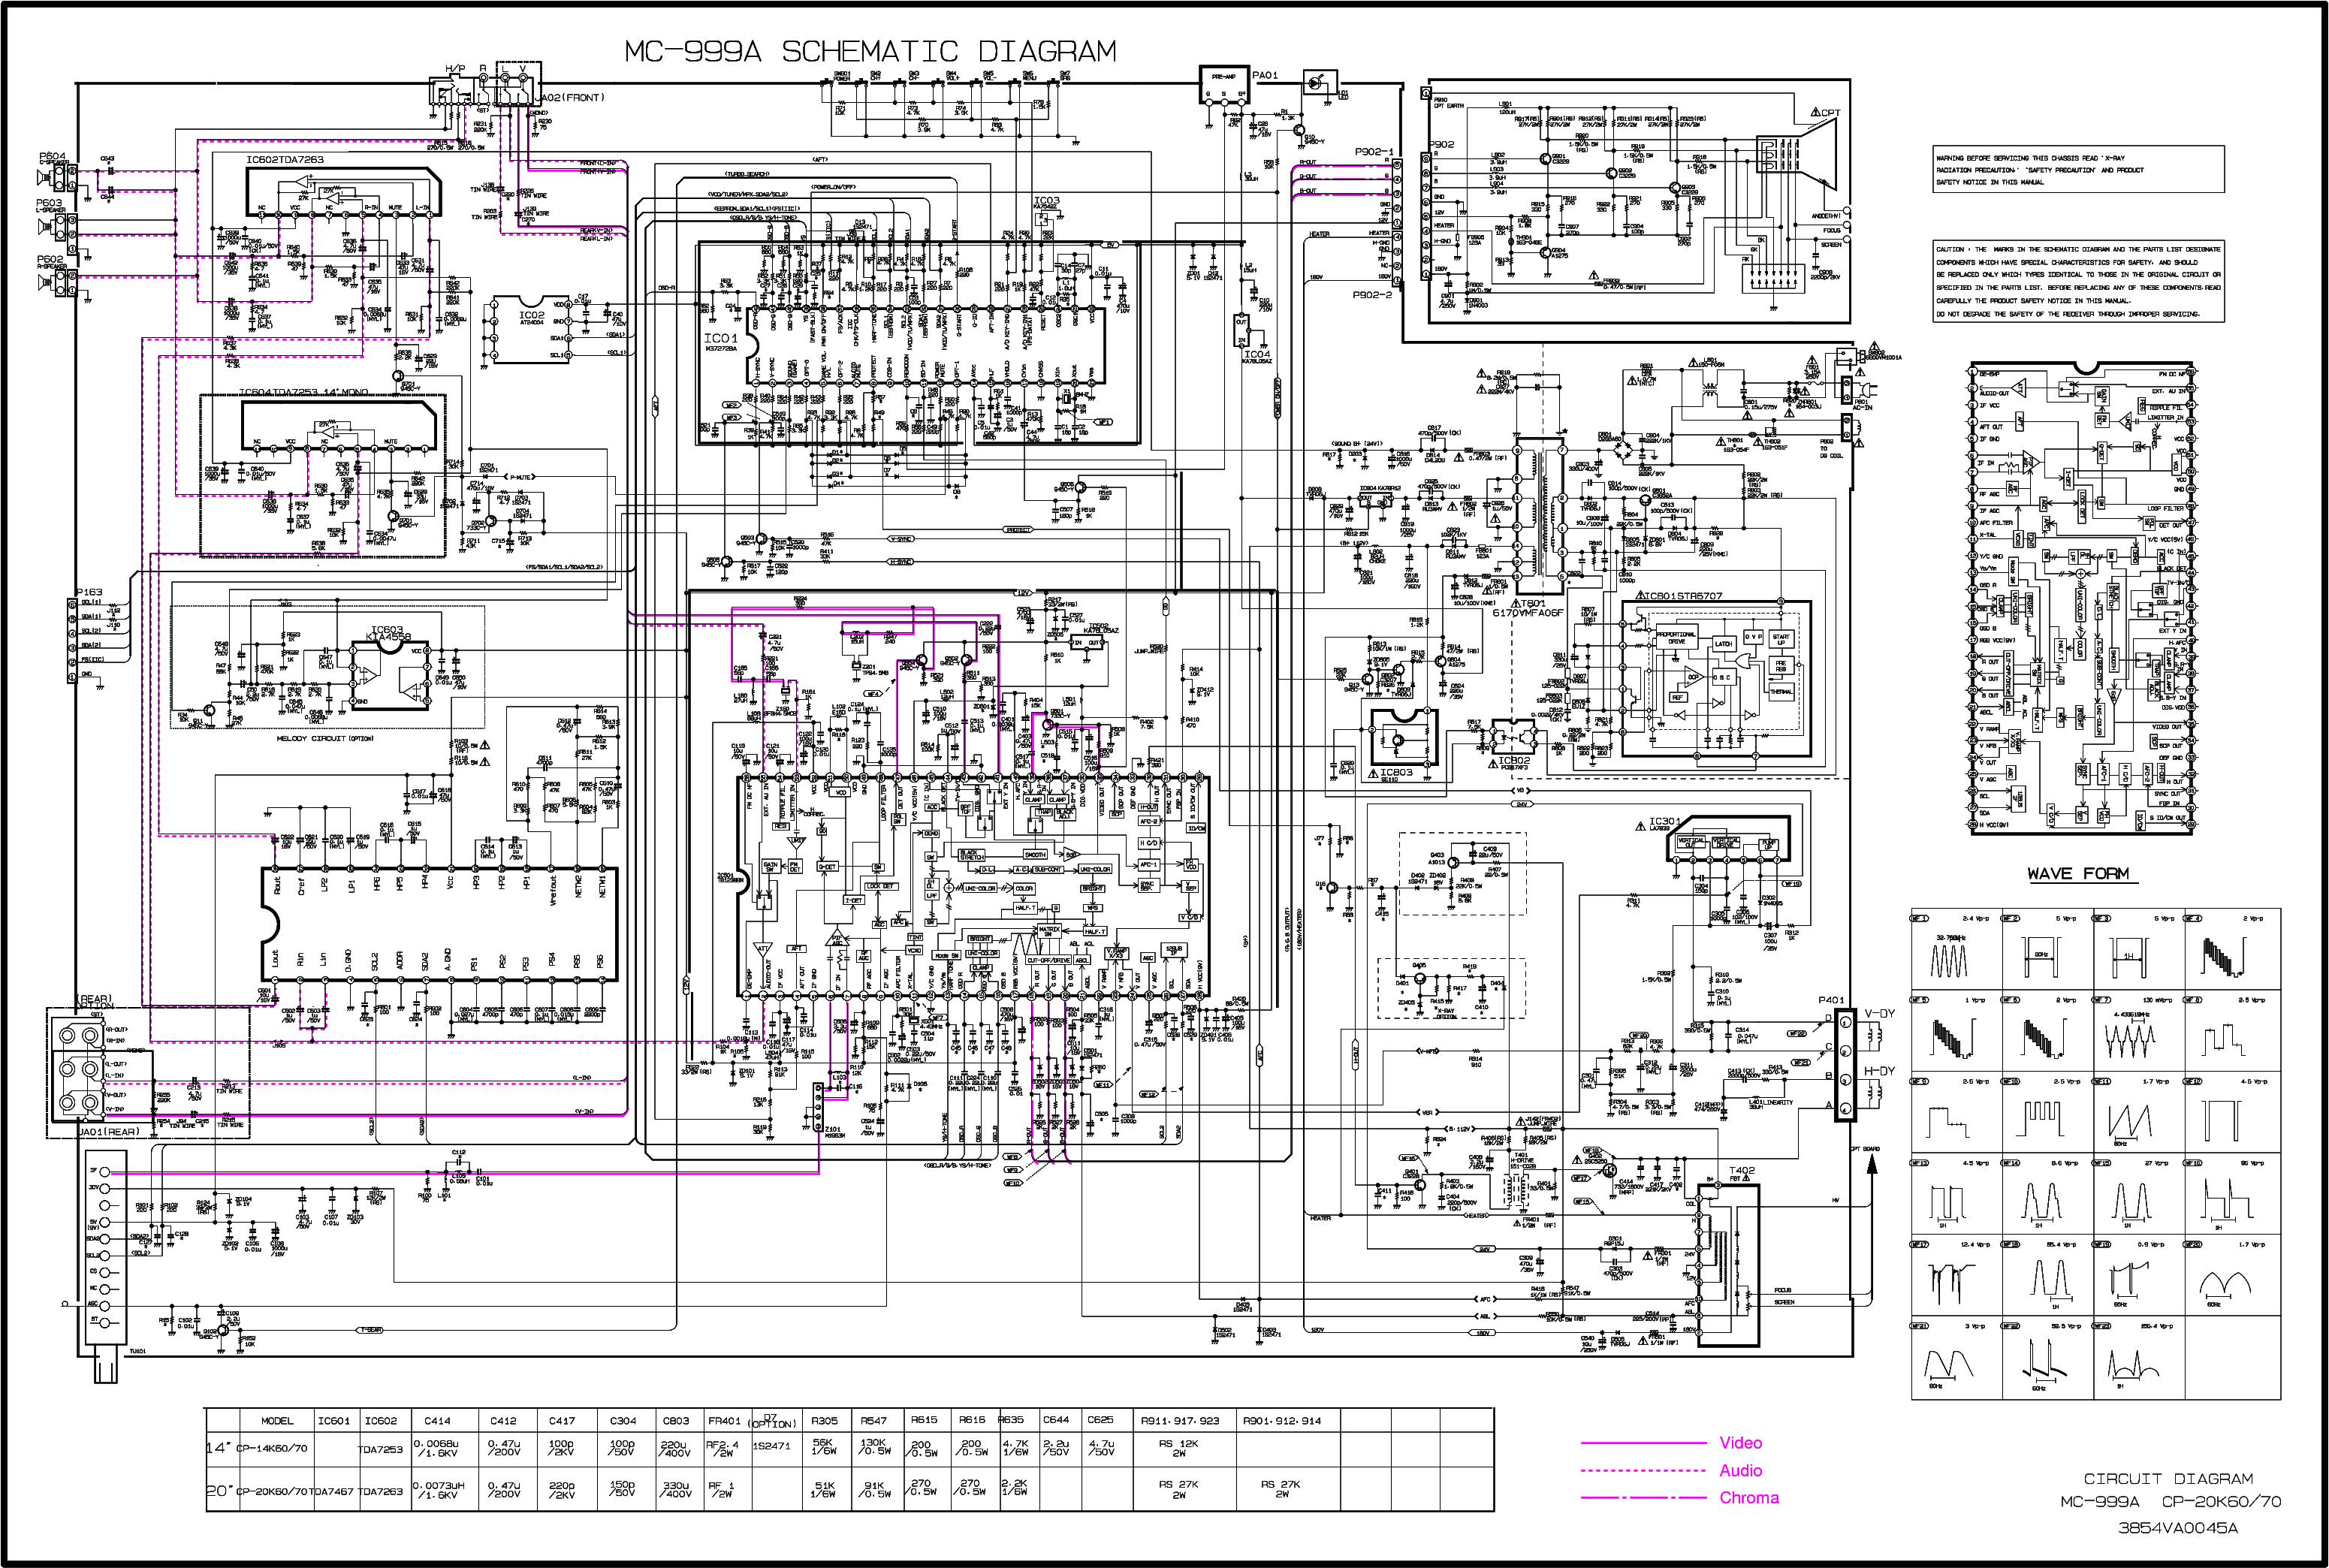 lg cp20k70 mc999a sch service manual download  schematics